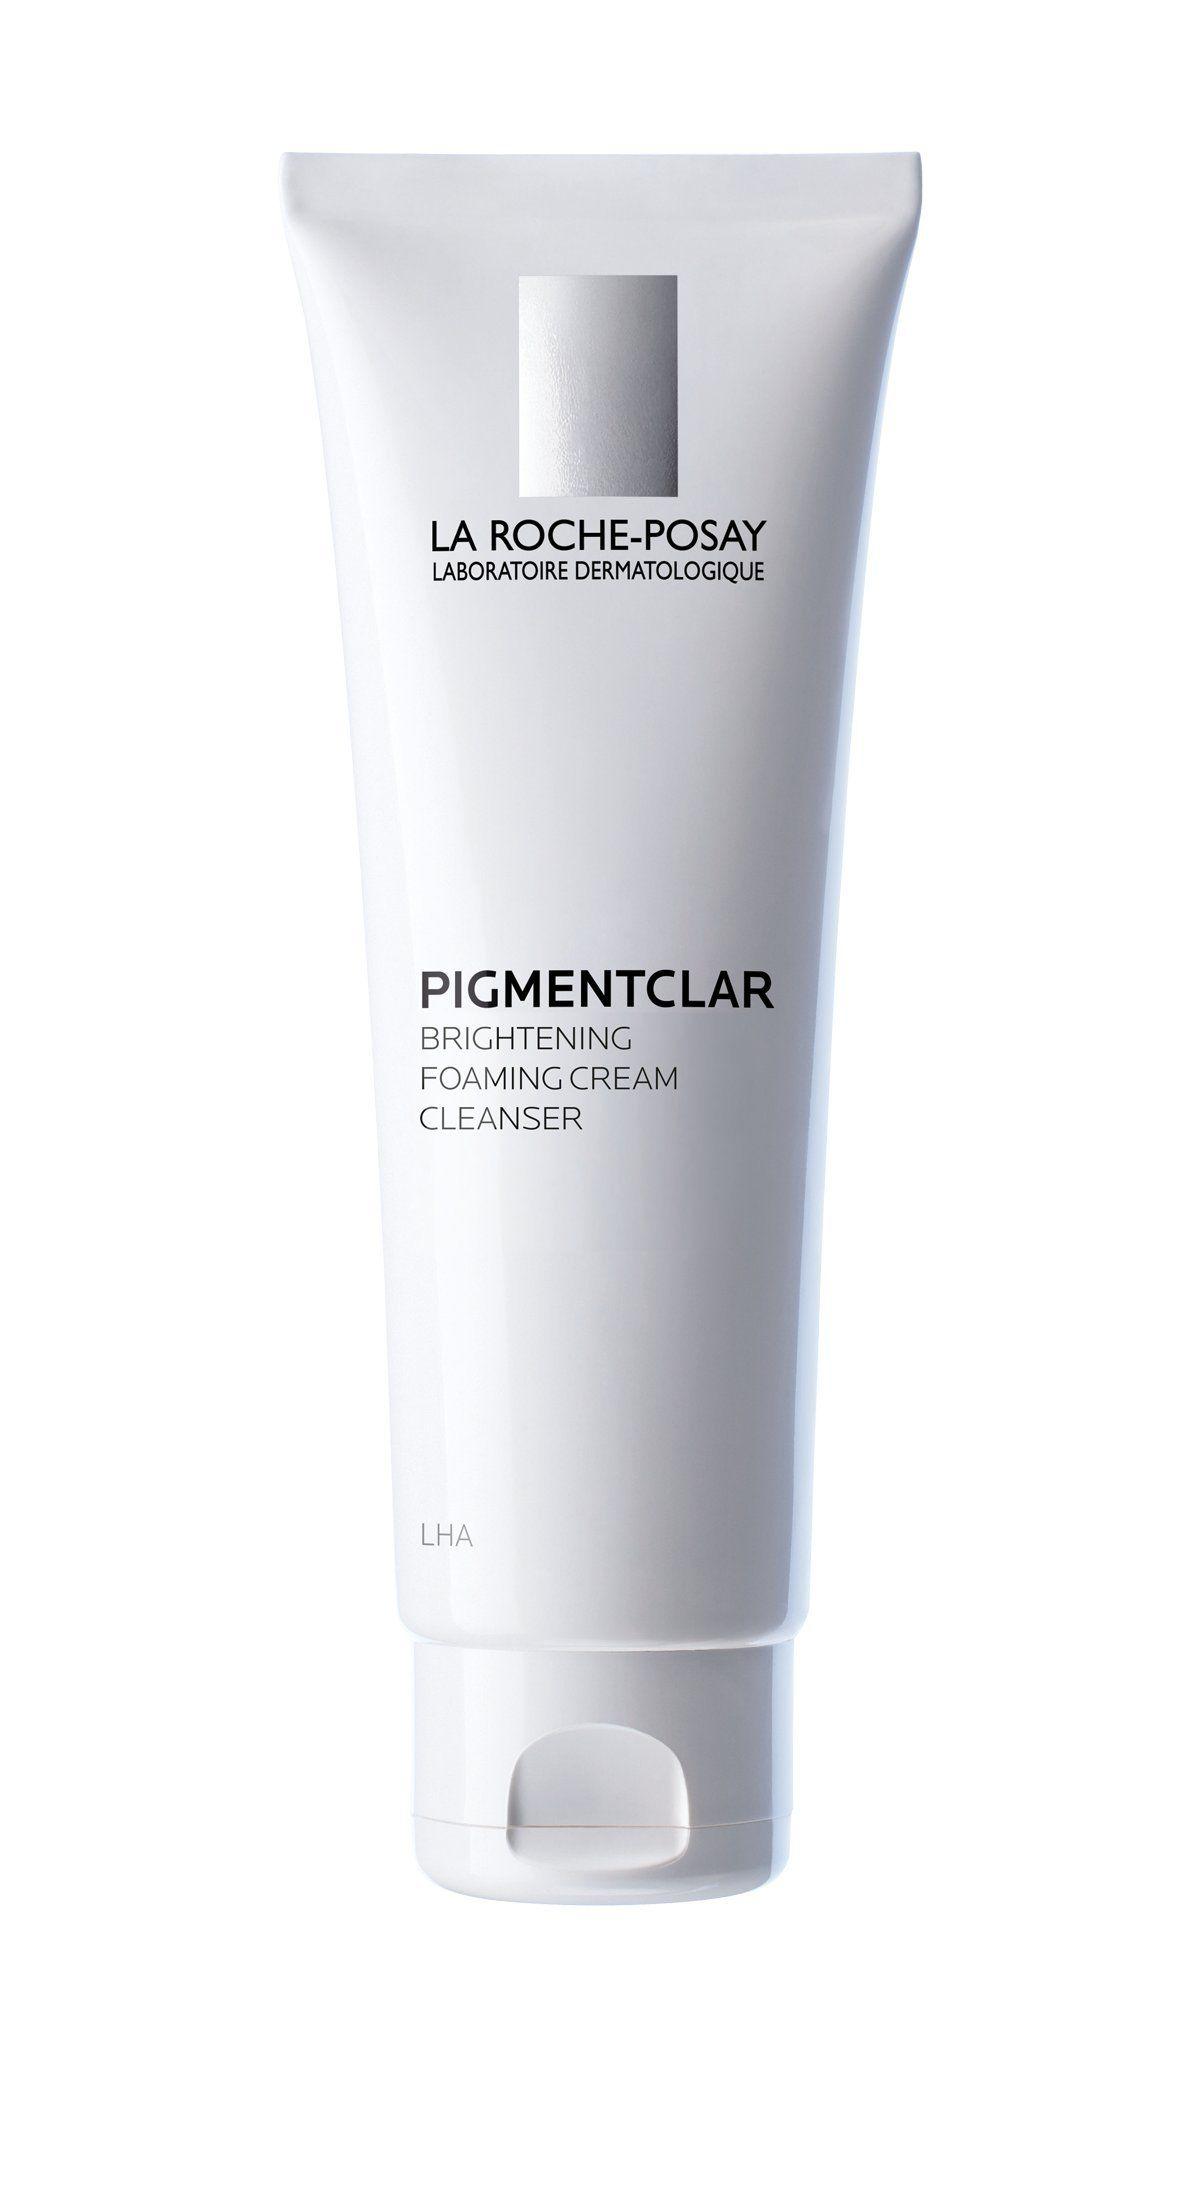 La RochePosay Pigmentclar Brightening Foaming Cream